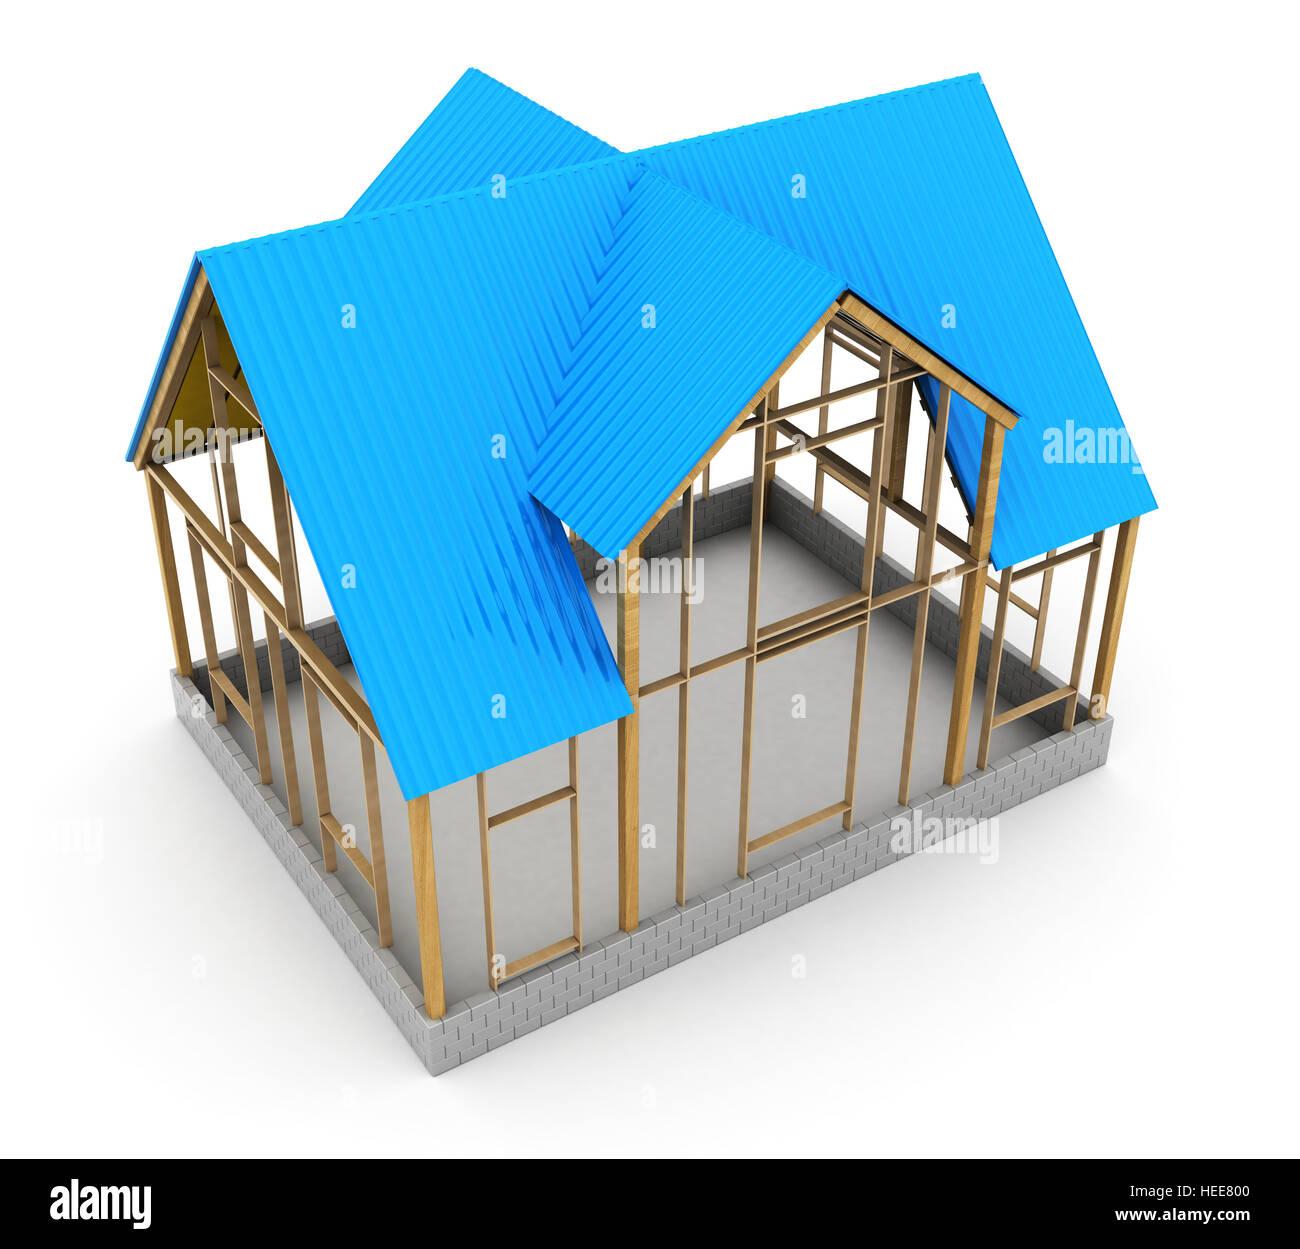 3d Illustration Of Frame House Construction, Blue Metal Roof